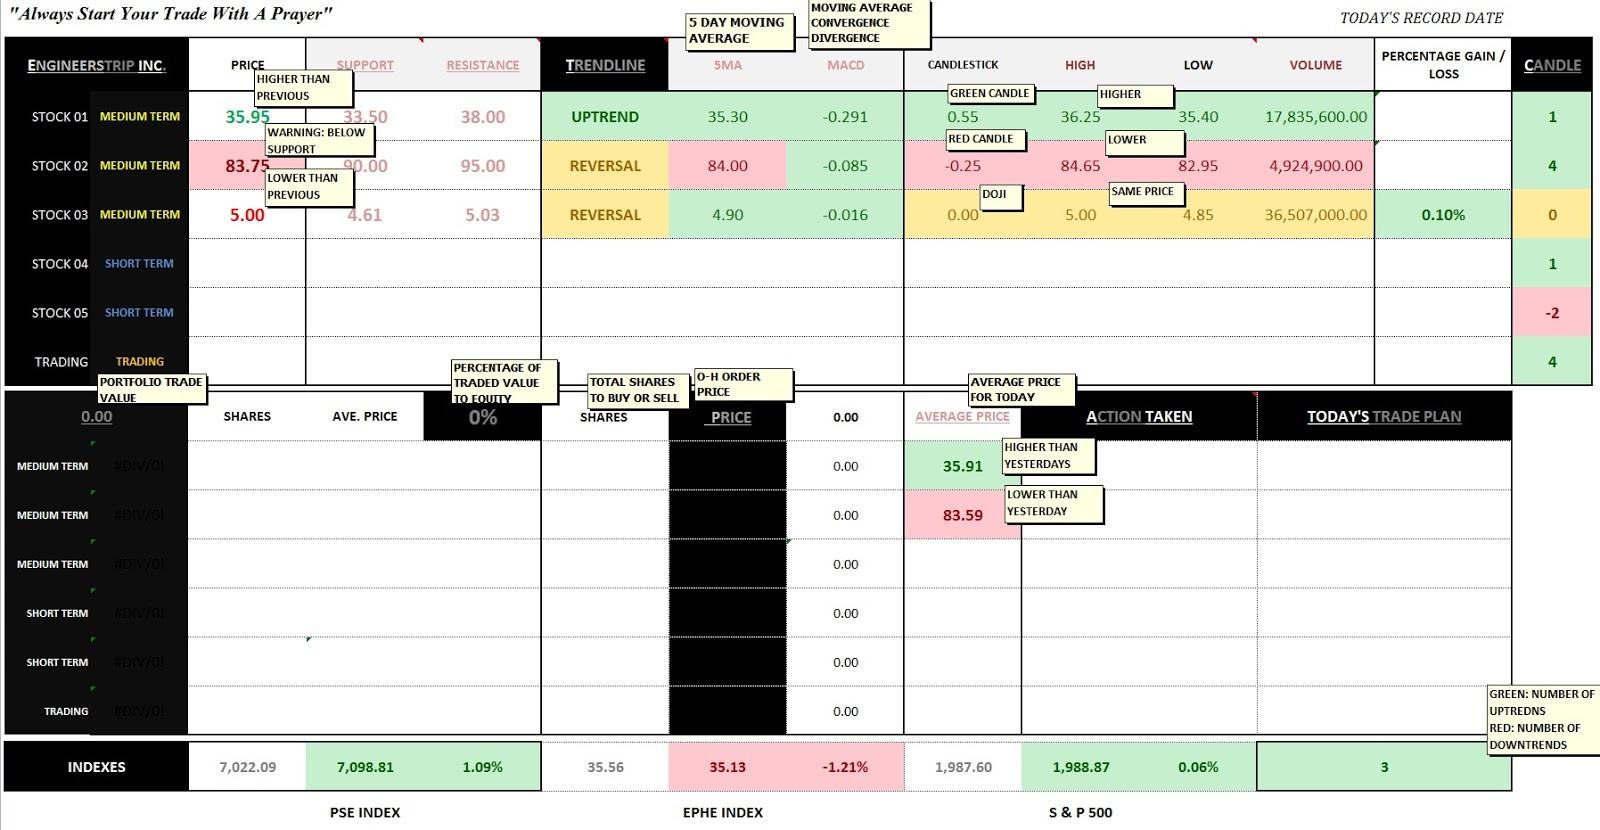 Tag binary option prediction indicator free download